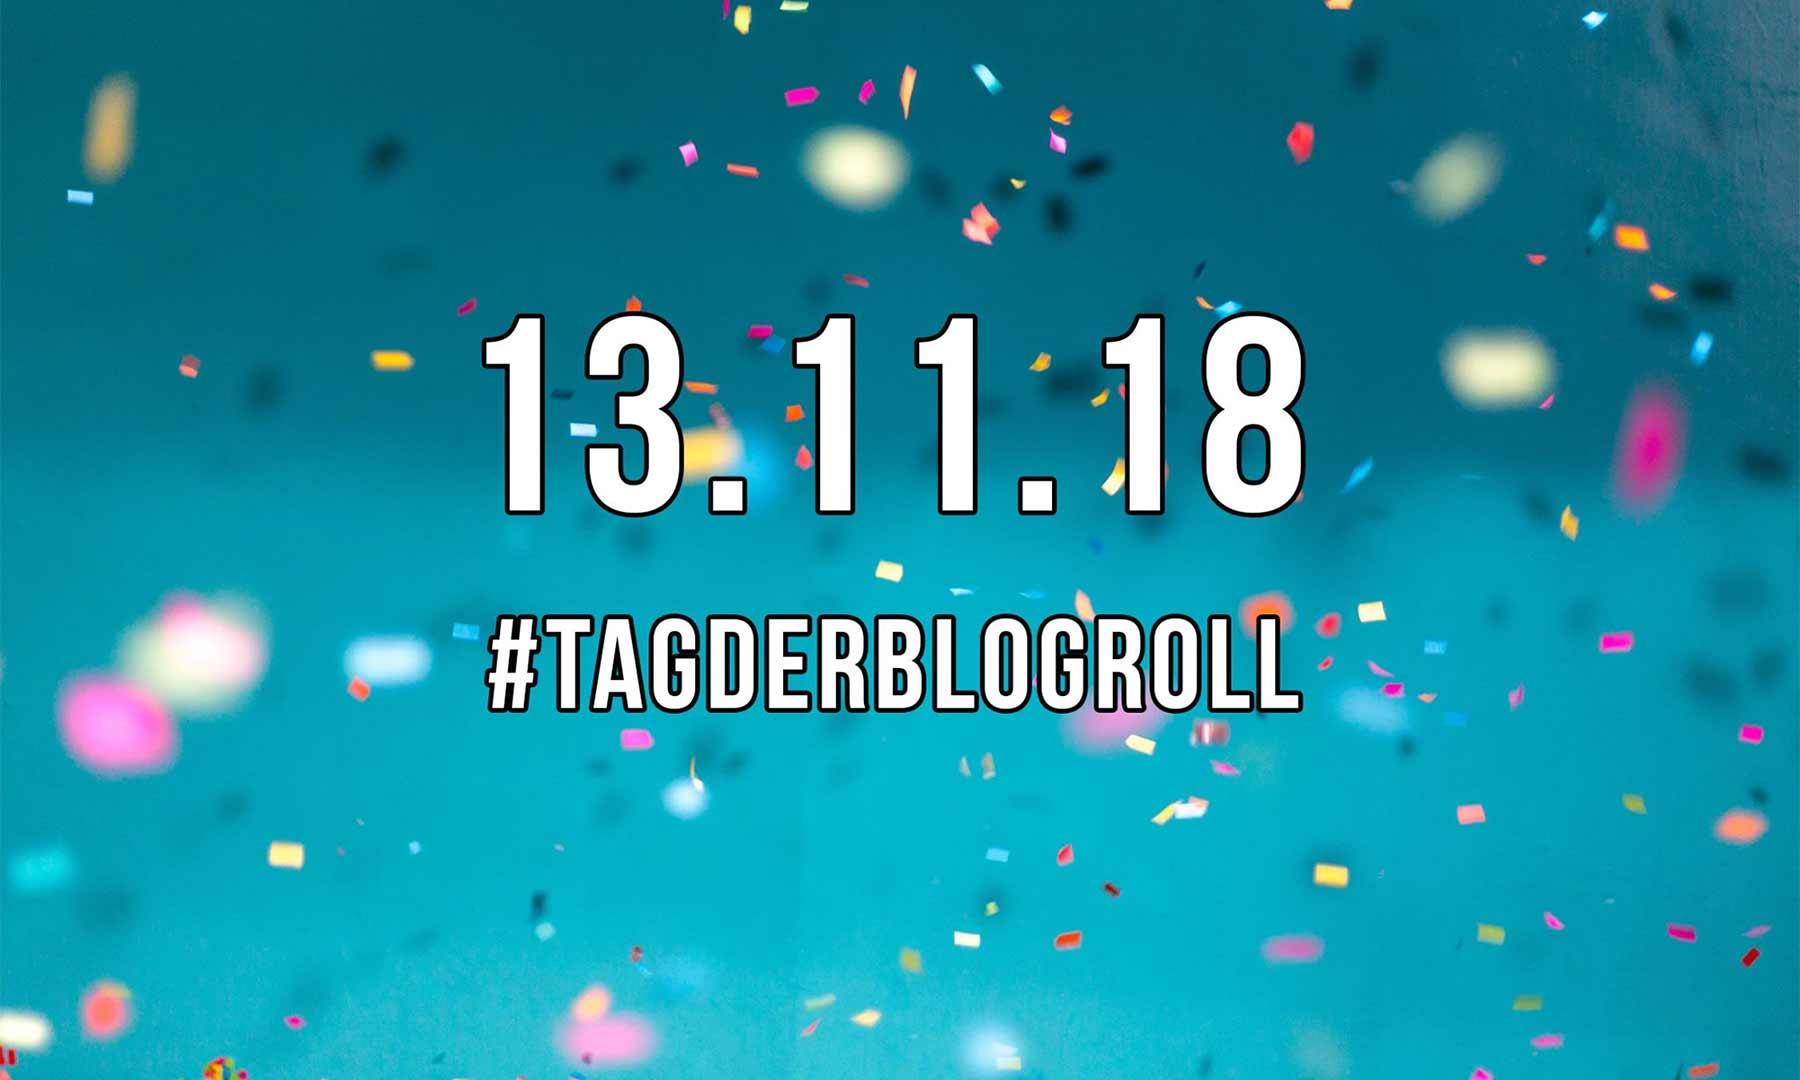 Am 13.11.2018 ist erster #TagderBlogroll